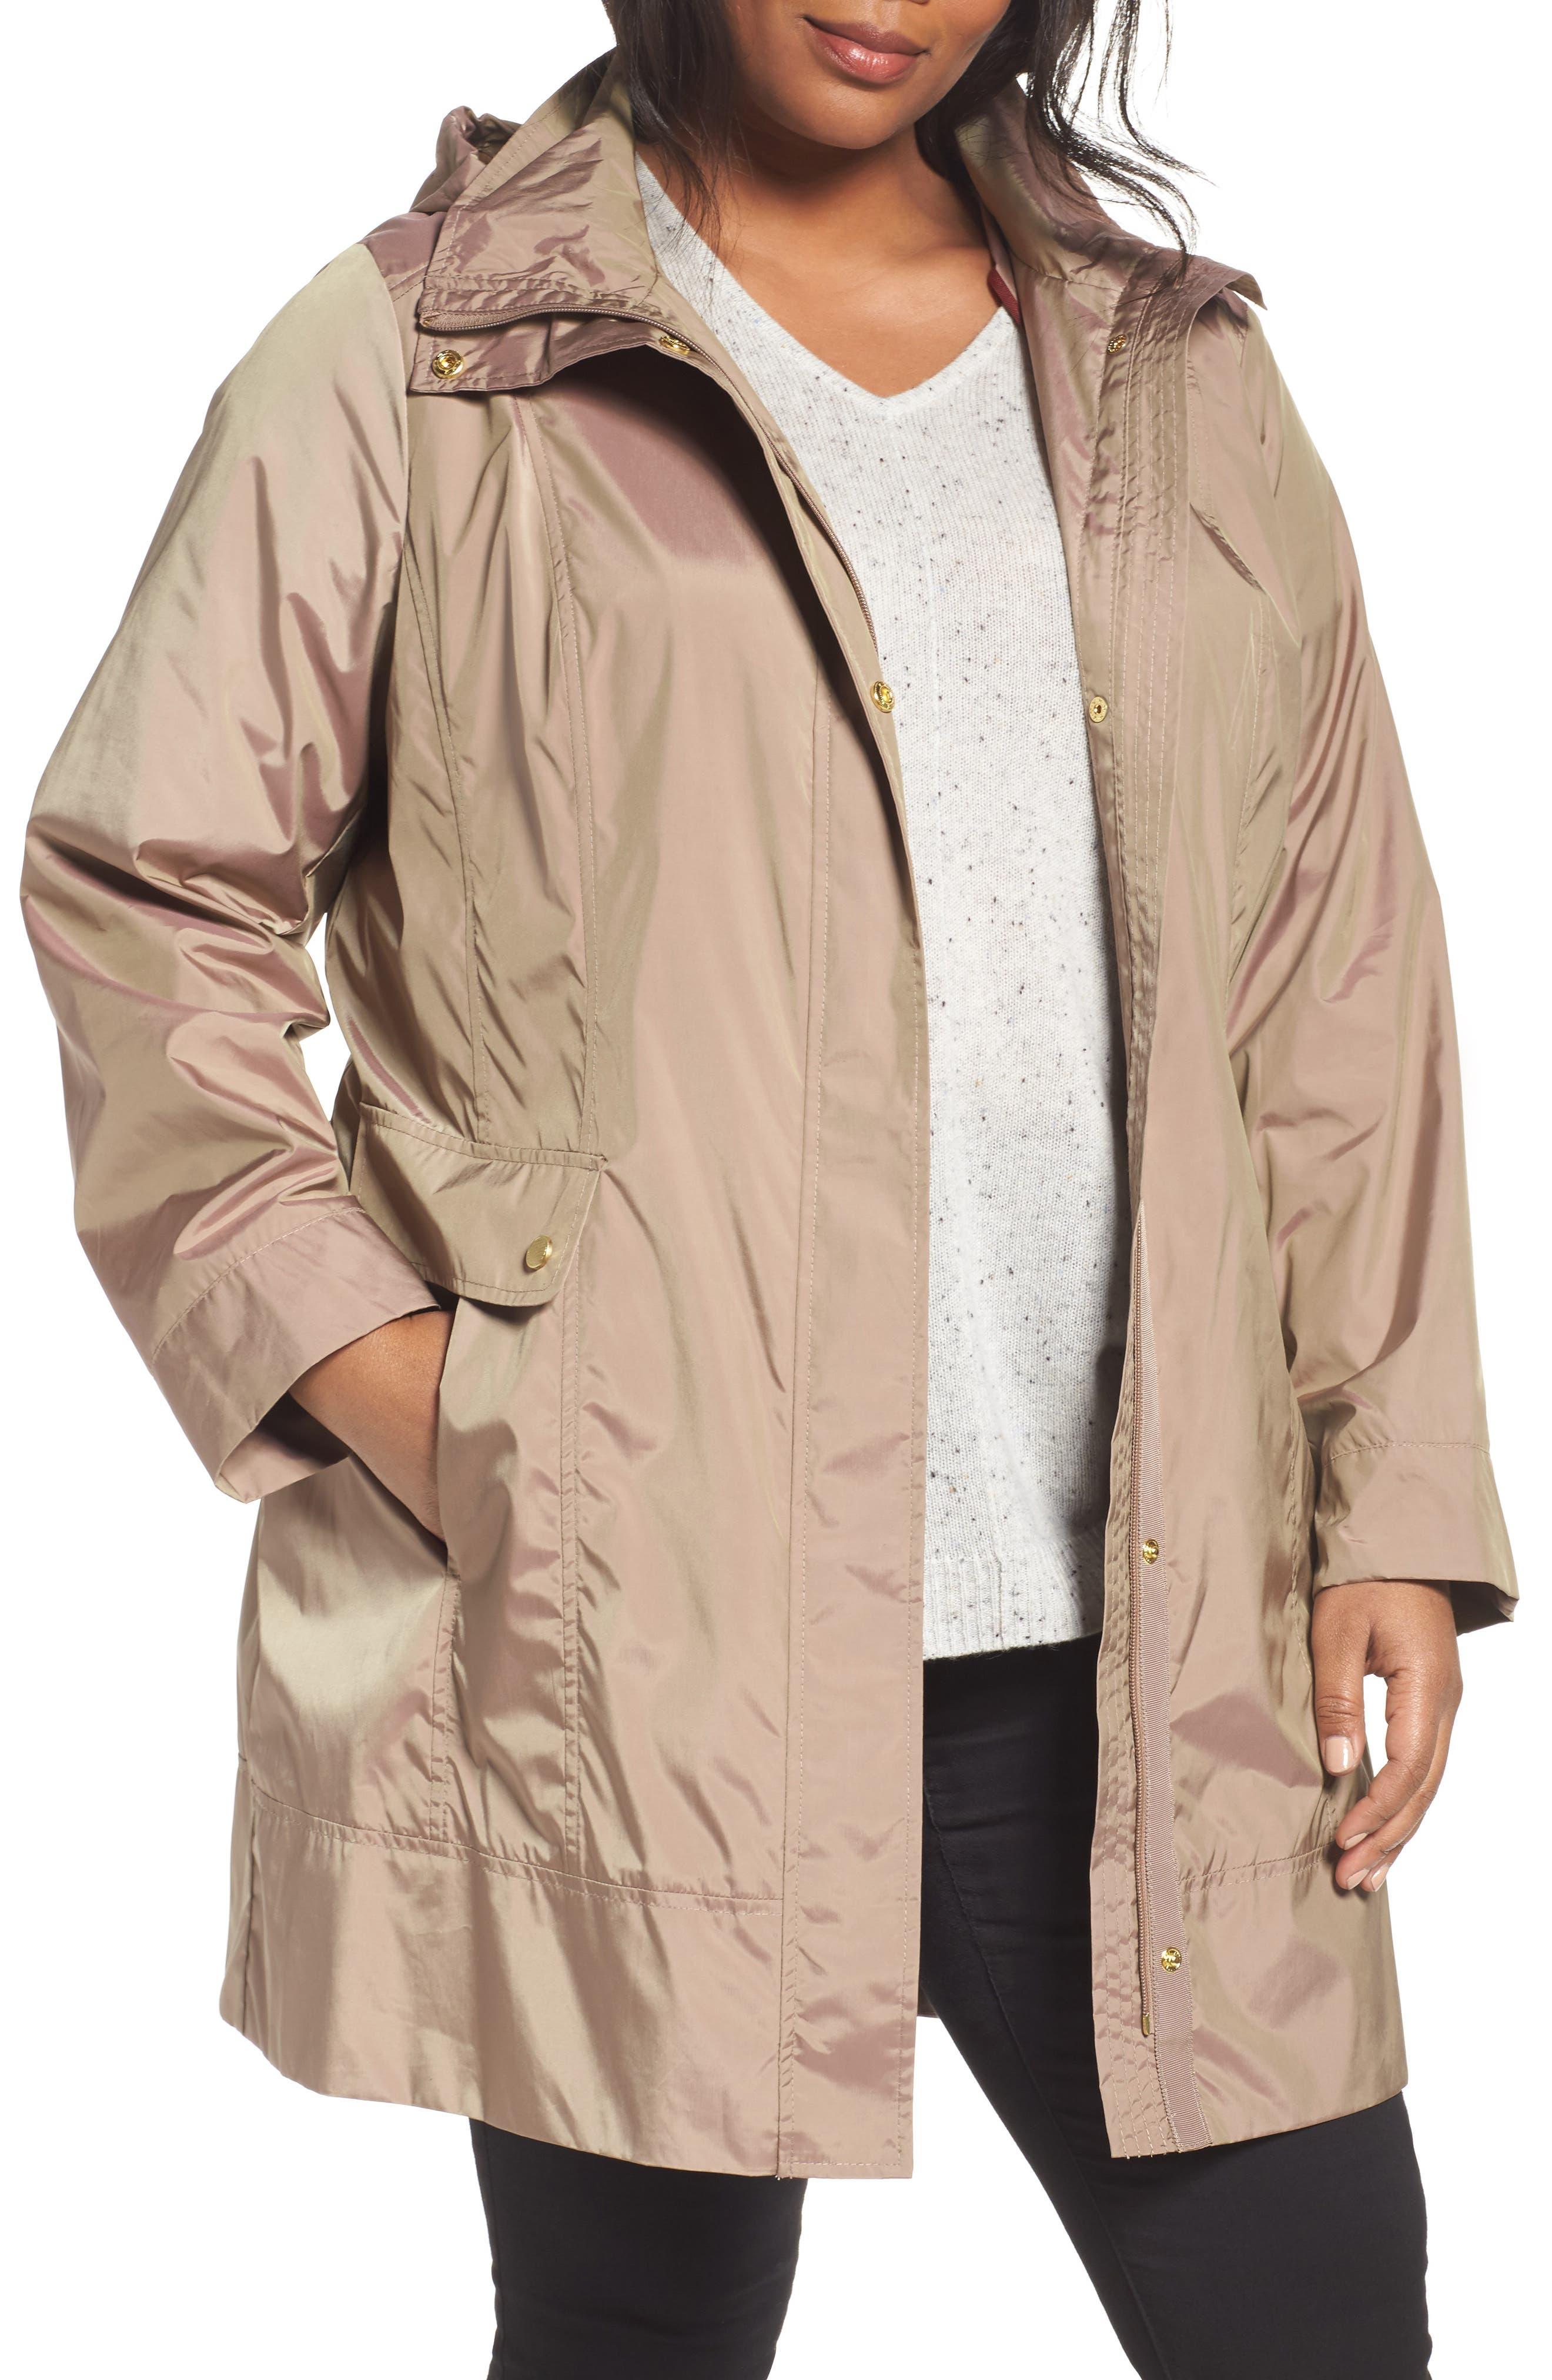 Main Image - Cole Haan Water Resistant Rain Jacket (Plus Size)